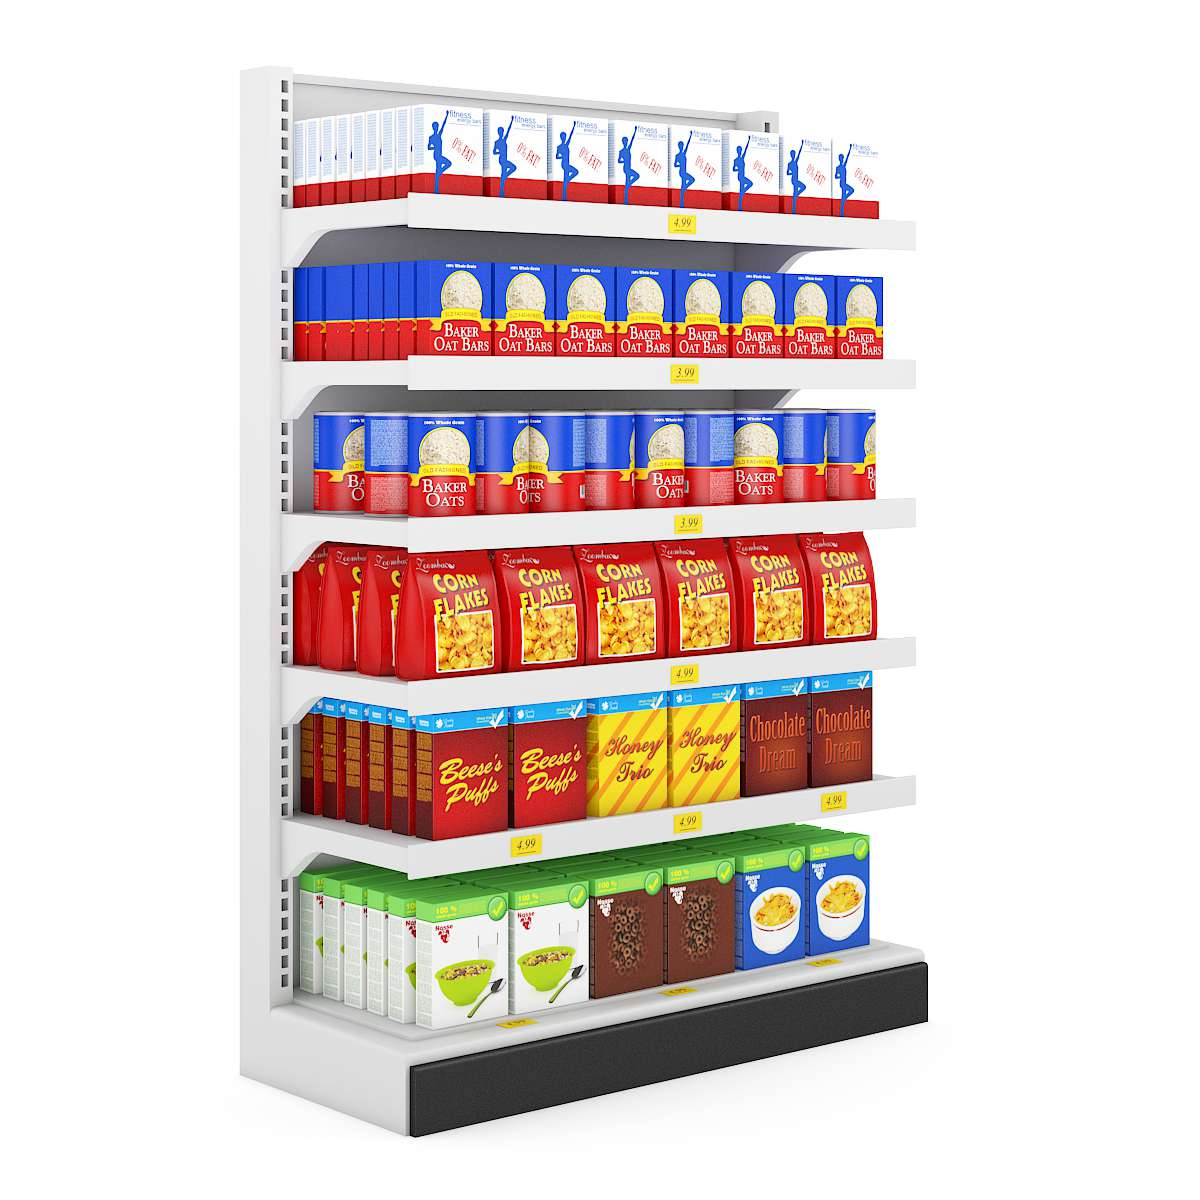 آبجکت لوازم سوپرمارکت